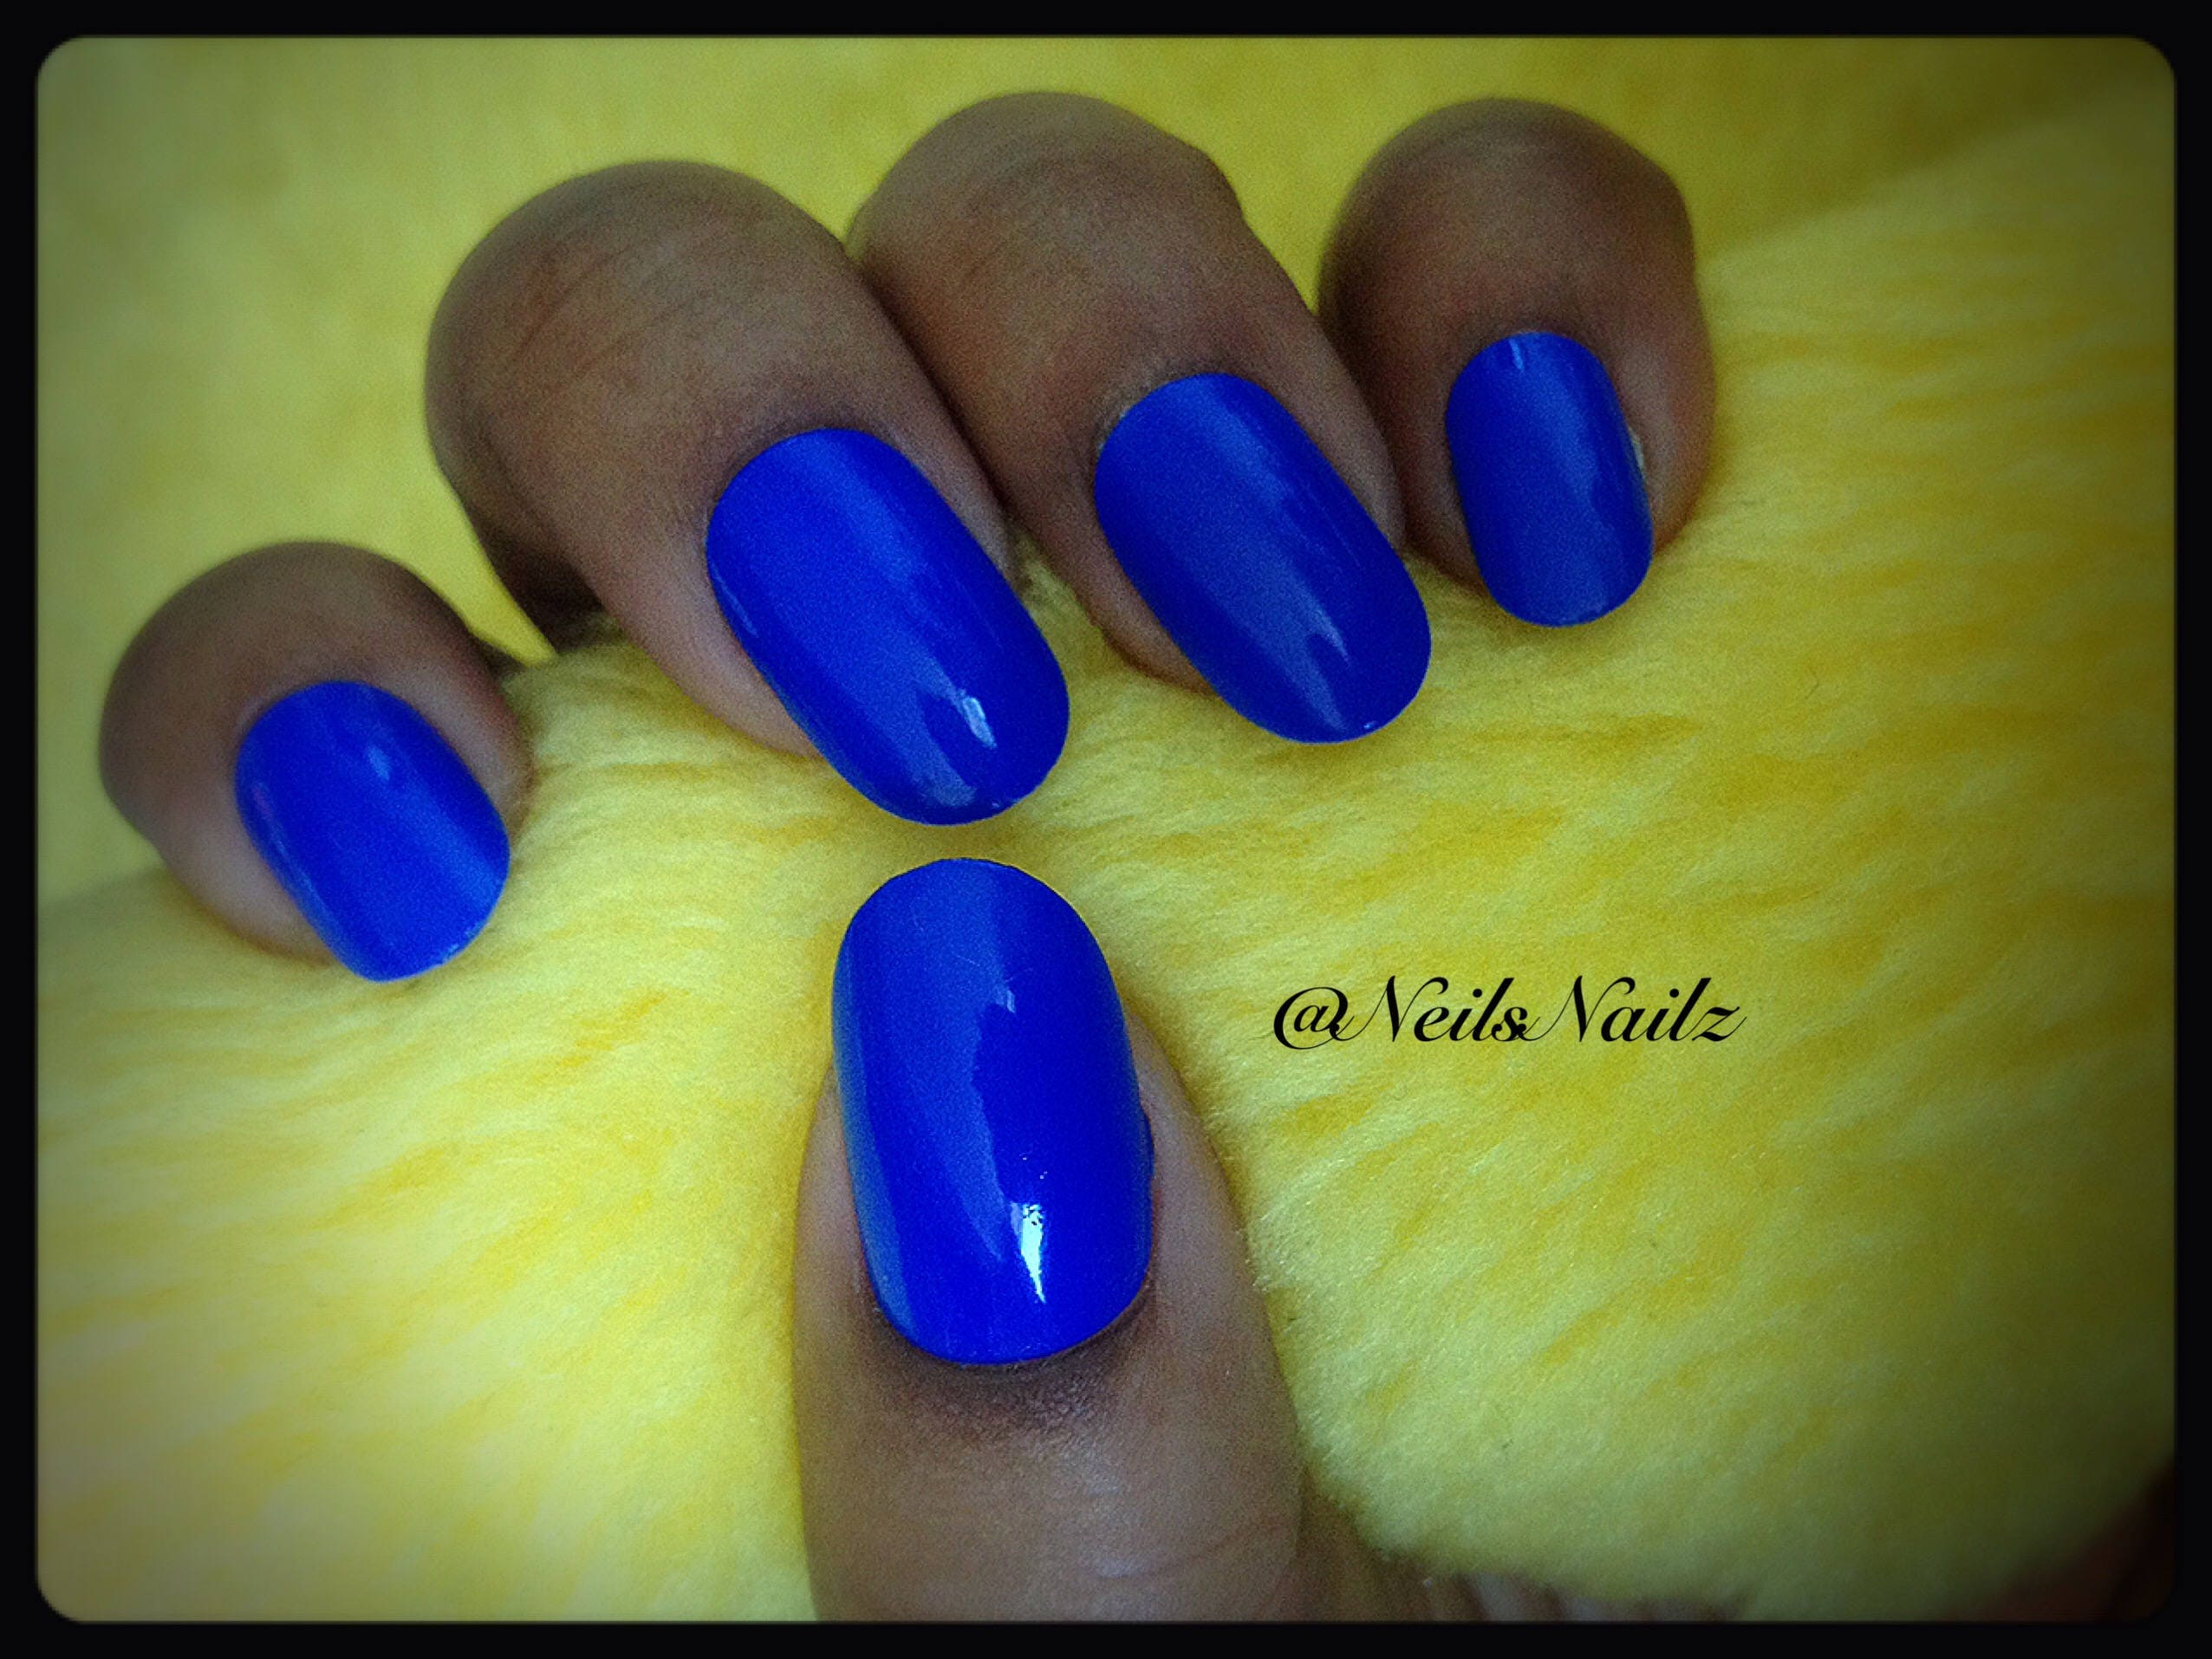 Uñas azul real, azul cobalto prensa en uñas, uñas ovaladas medianas ...